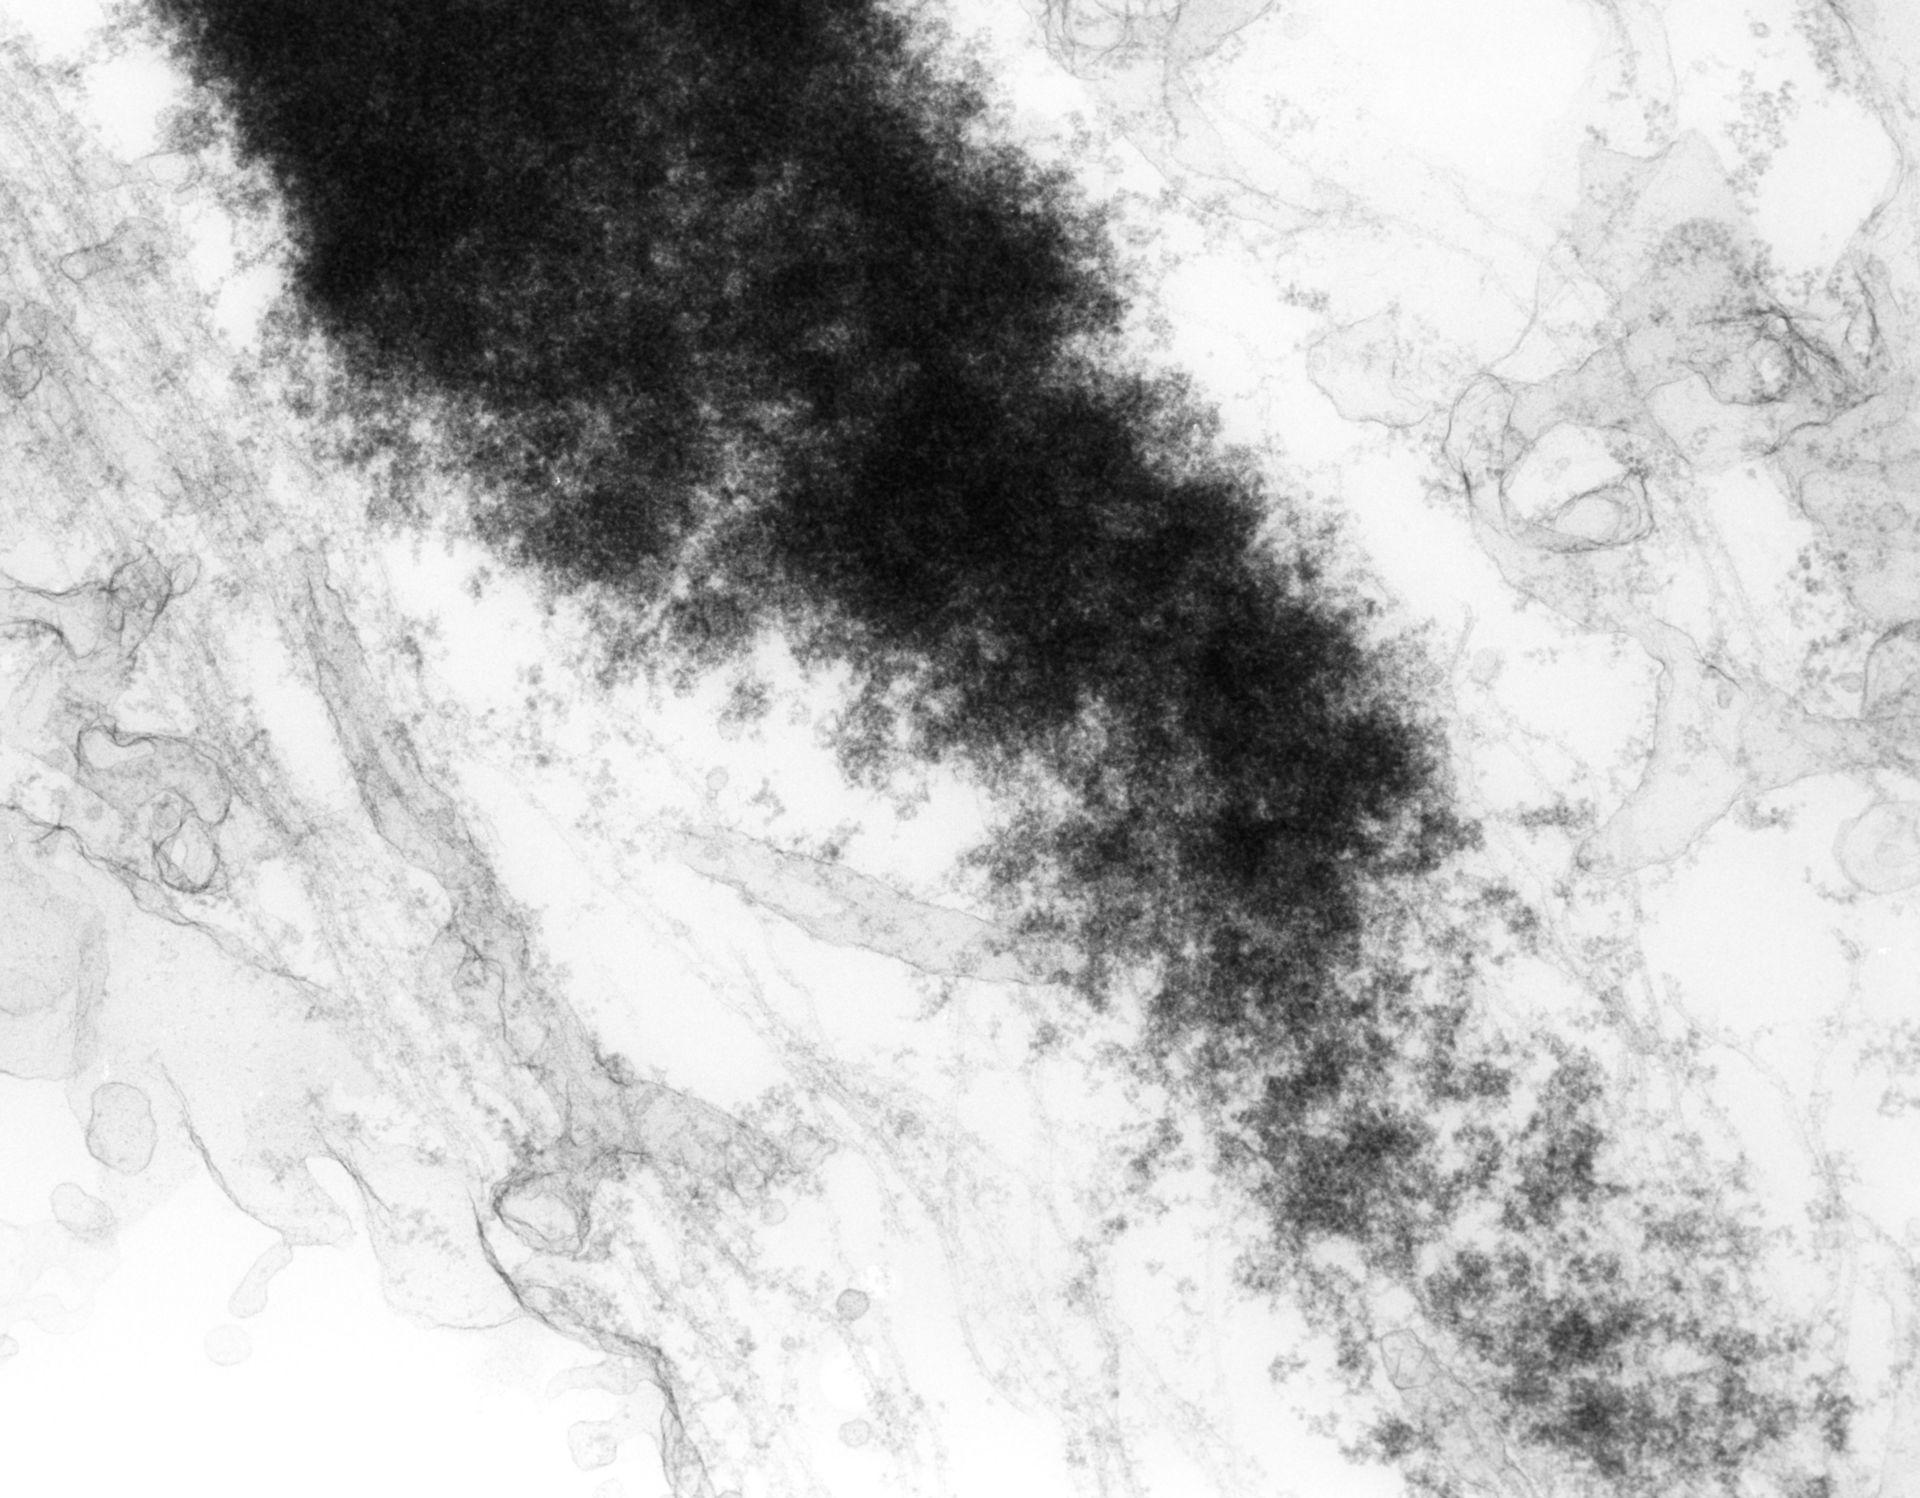 Haemanthus katharinae (Nuclear chromosome) - CIL:11853